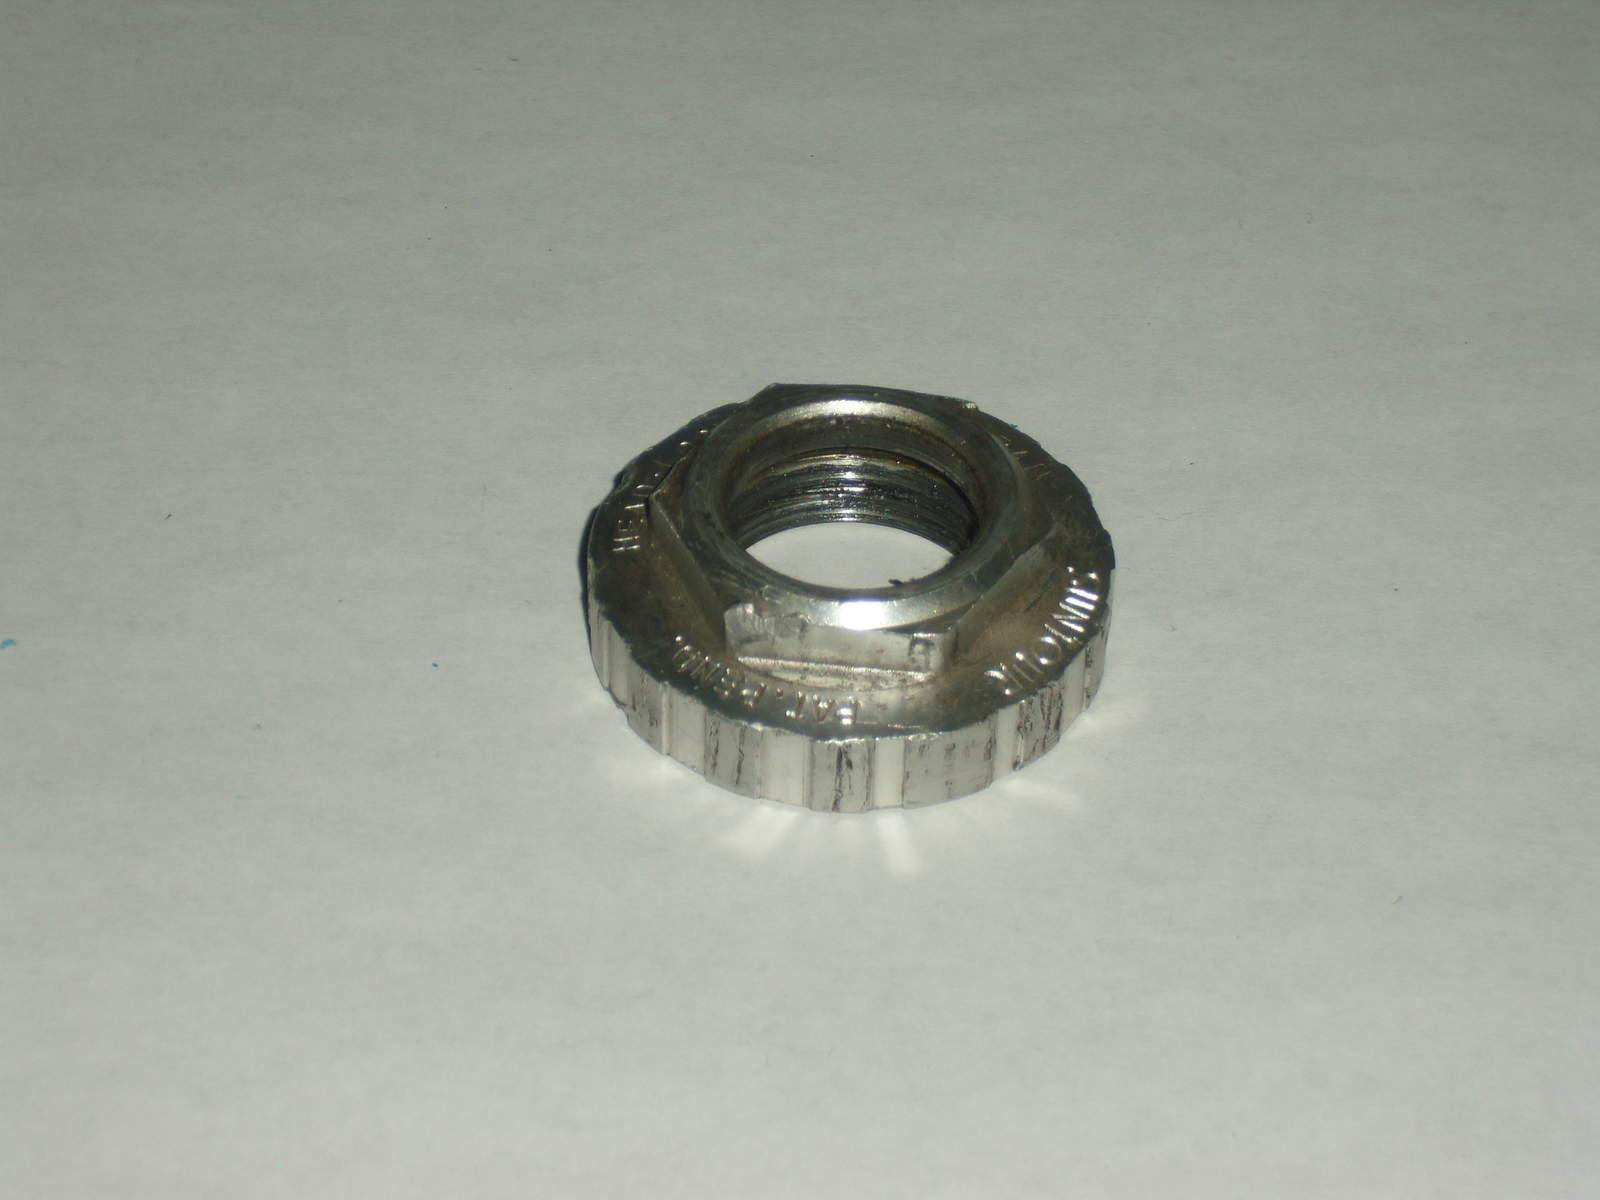 http://uploads.bmxmuseum.com/user-images/18293/dsci05175a56719491.jpg